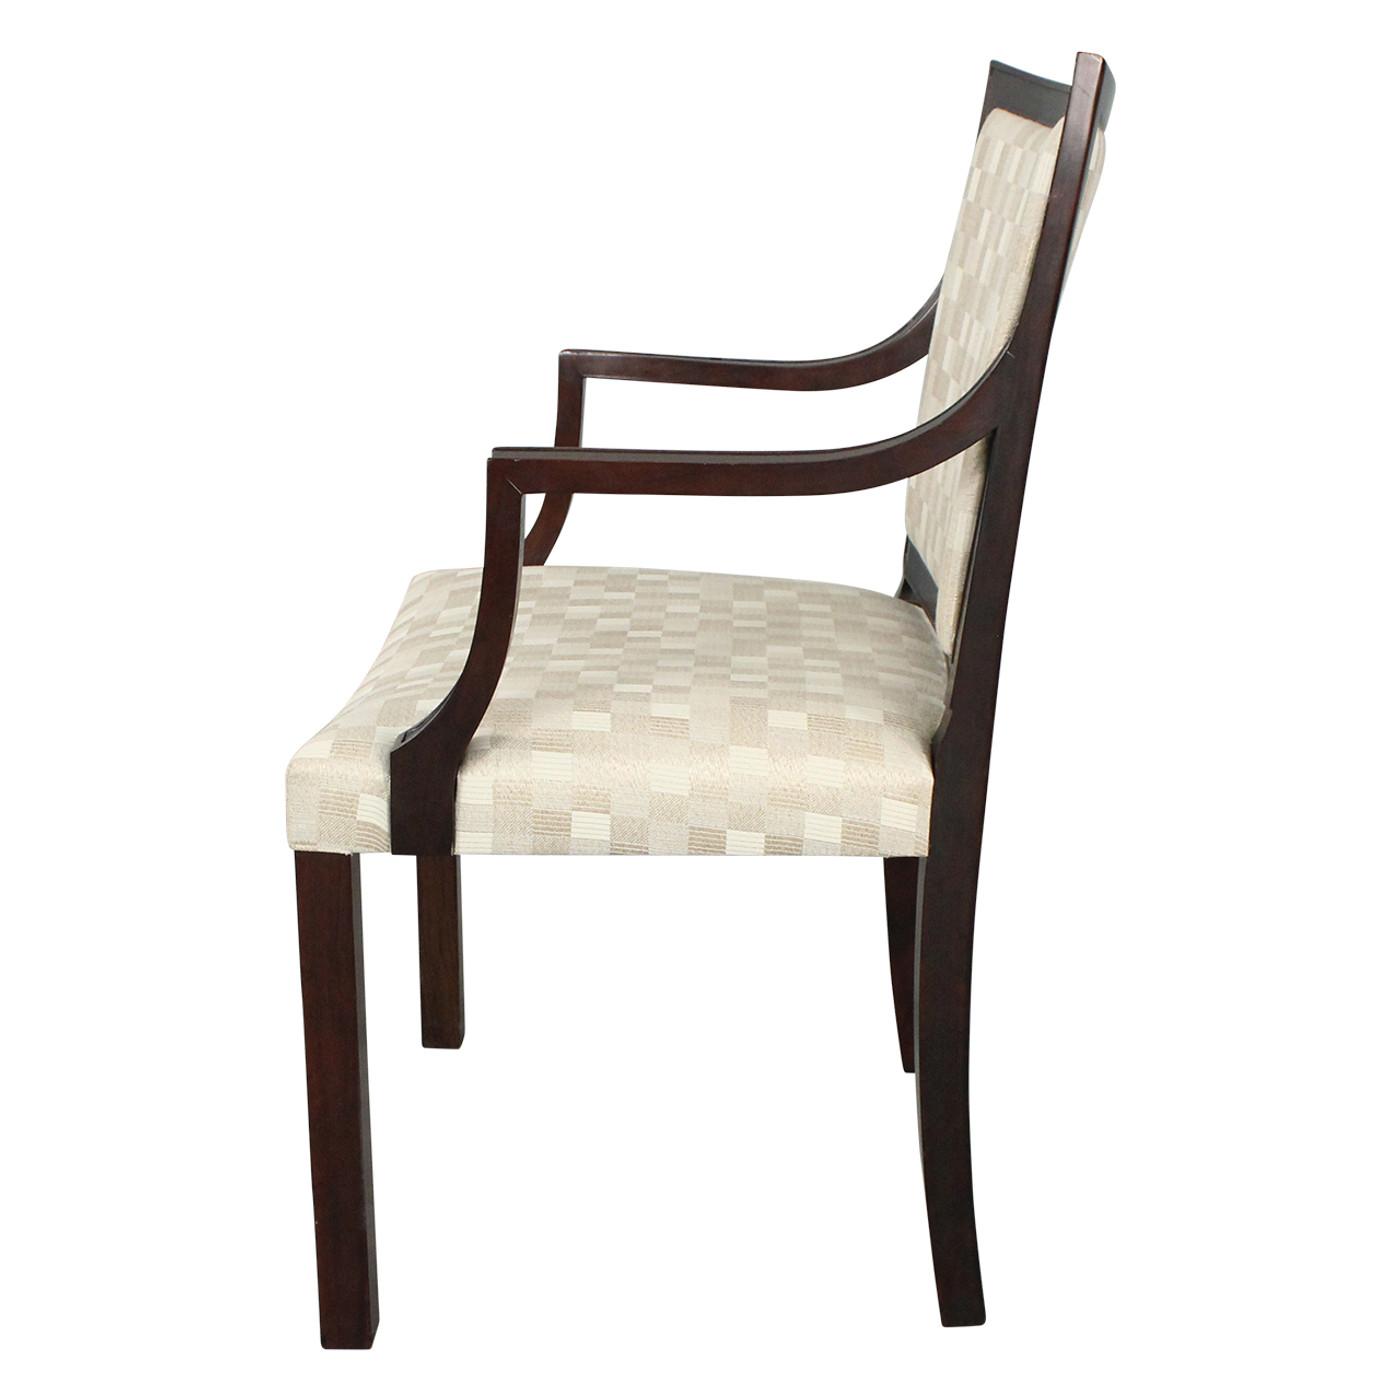 Marston Chair - Arm #1